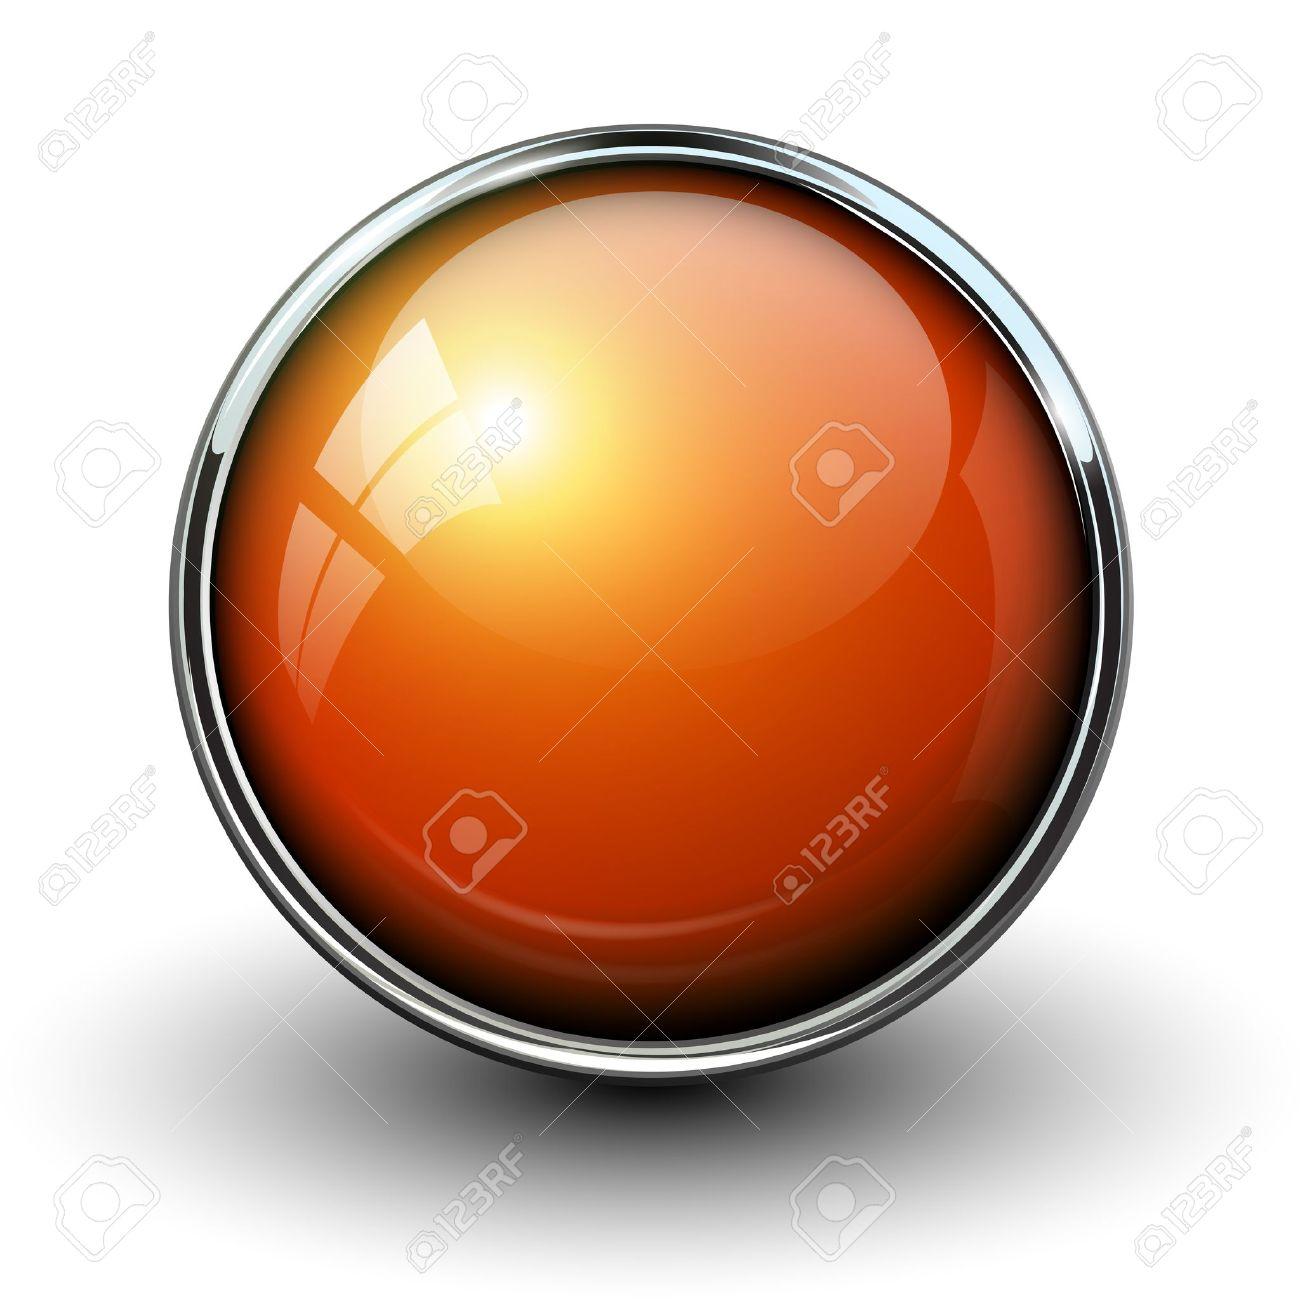 Orange shiny button with metallic elements, vector design for website. Stock Vector - 16798259